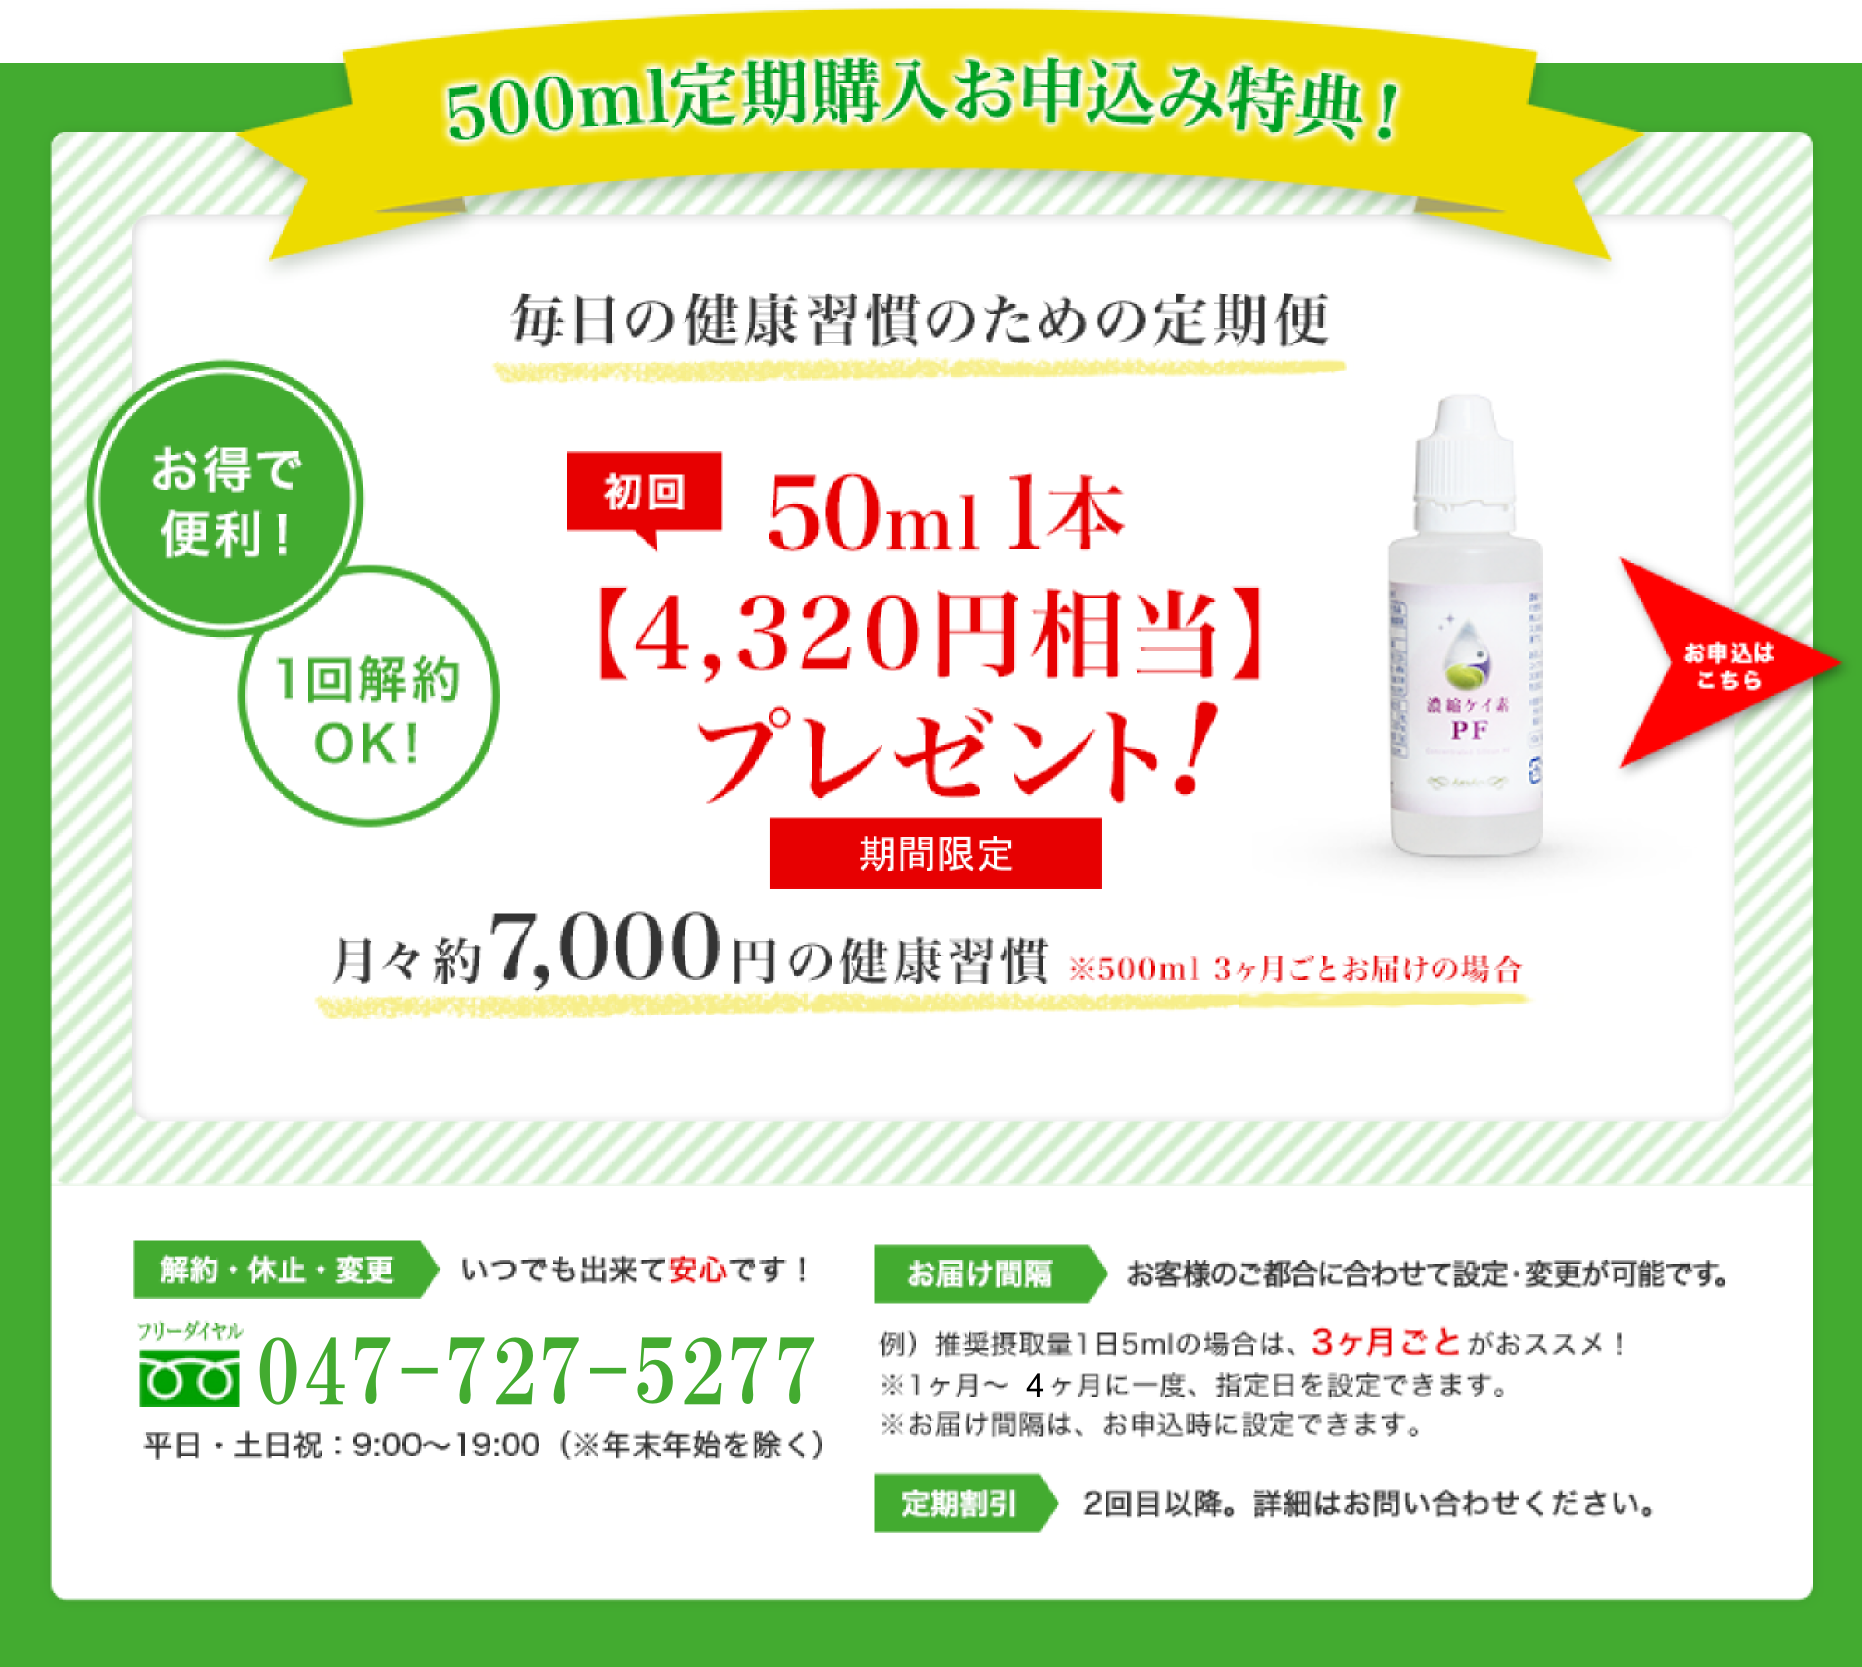 500ml定期購入お申込み特典! 初回 50ml1本【4,320円相当】プレゼント